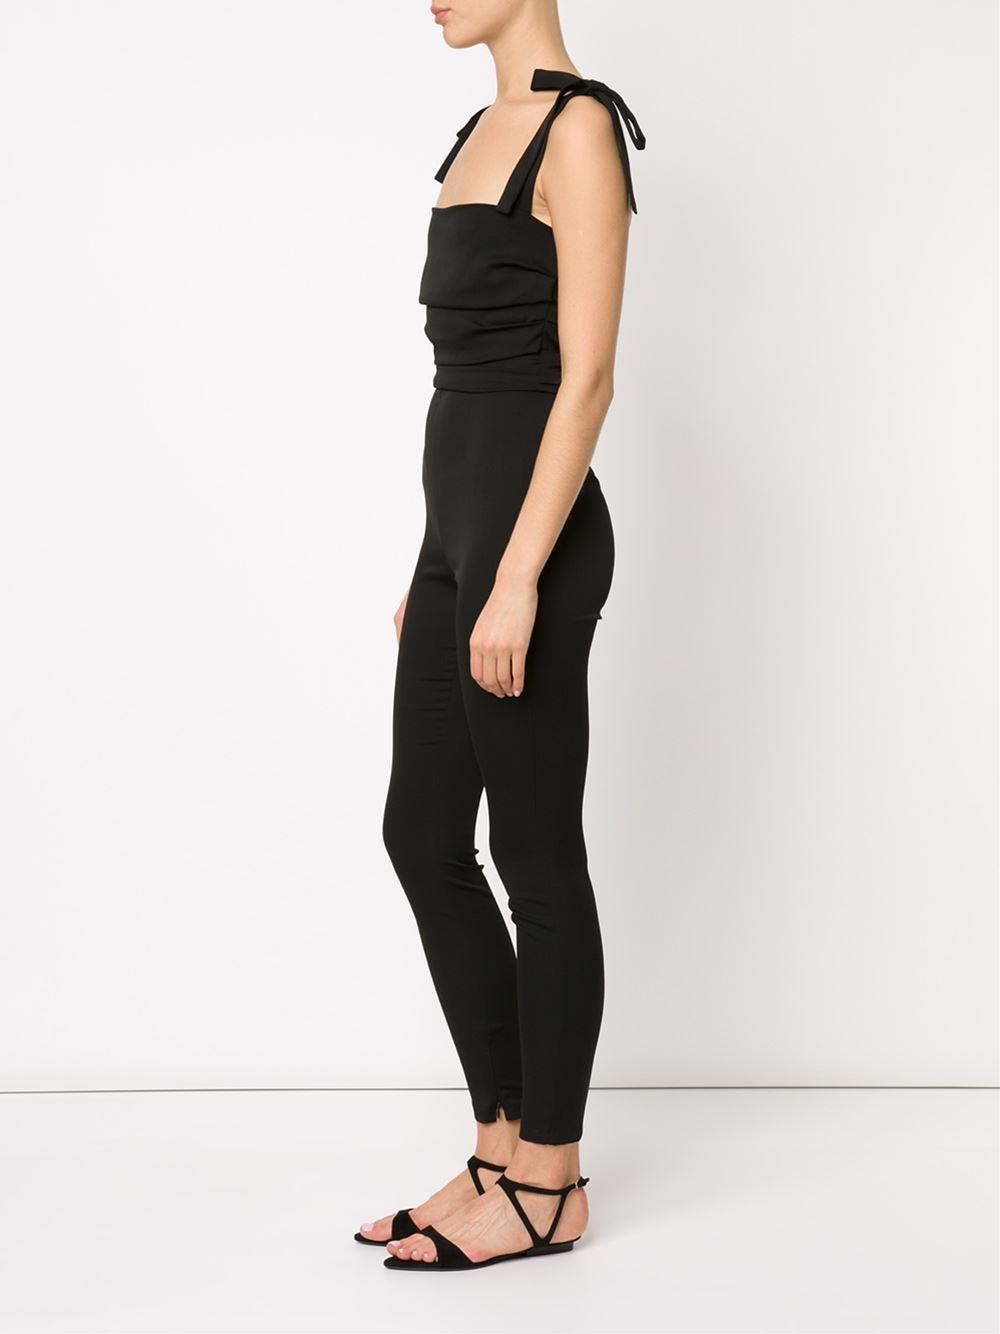 Dolce Amp Gabbana Tie Shoulder Strap Jumpsuit In Black Lyst